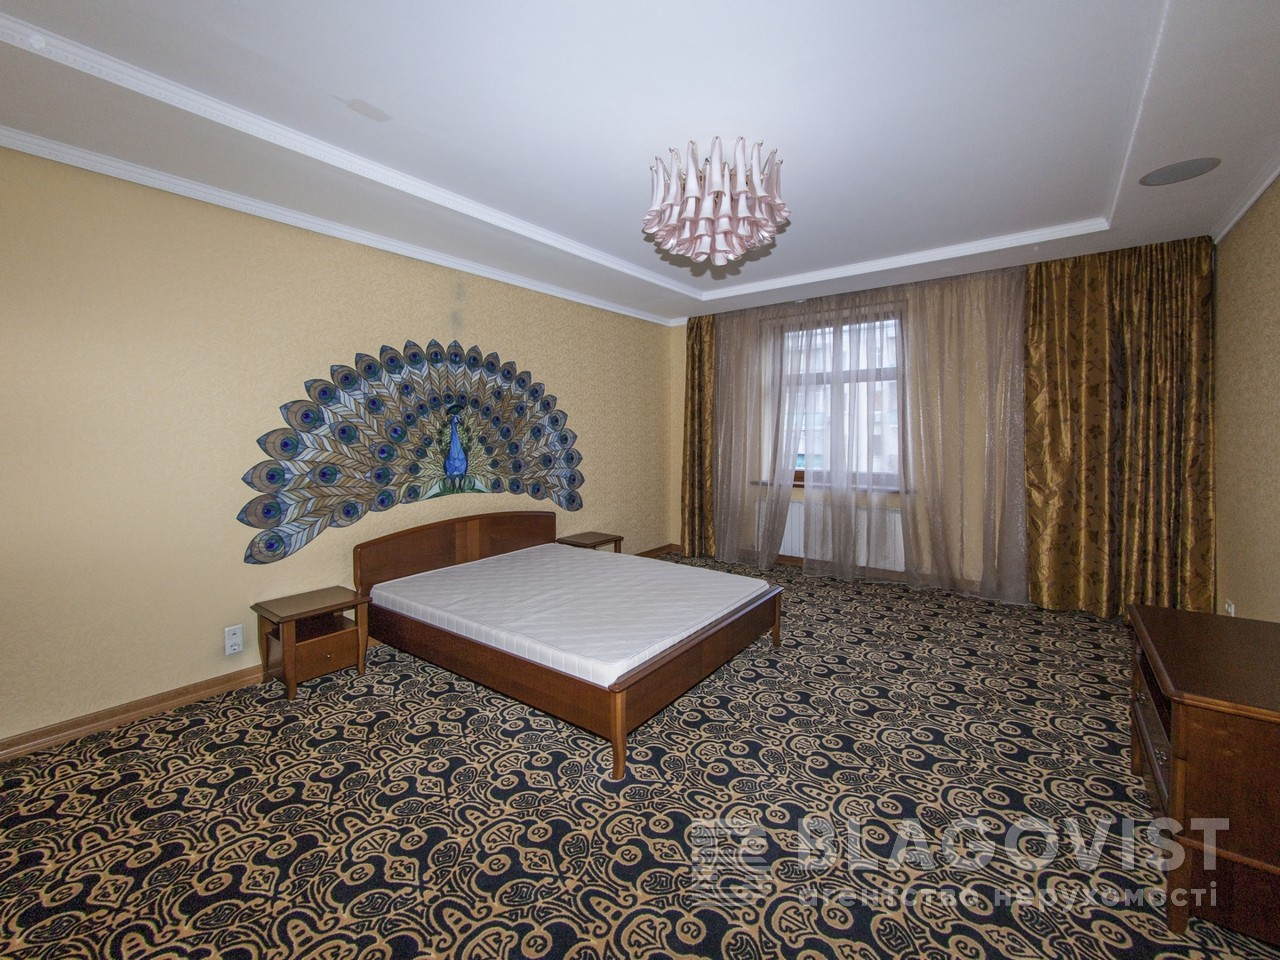 Квартира A-103686, Владимирская, 79, Киев - Фото 13